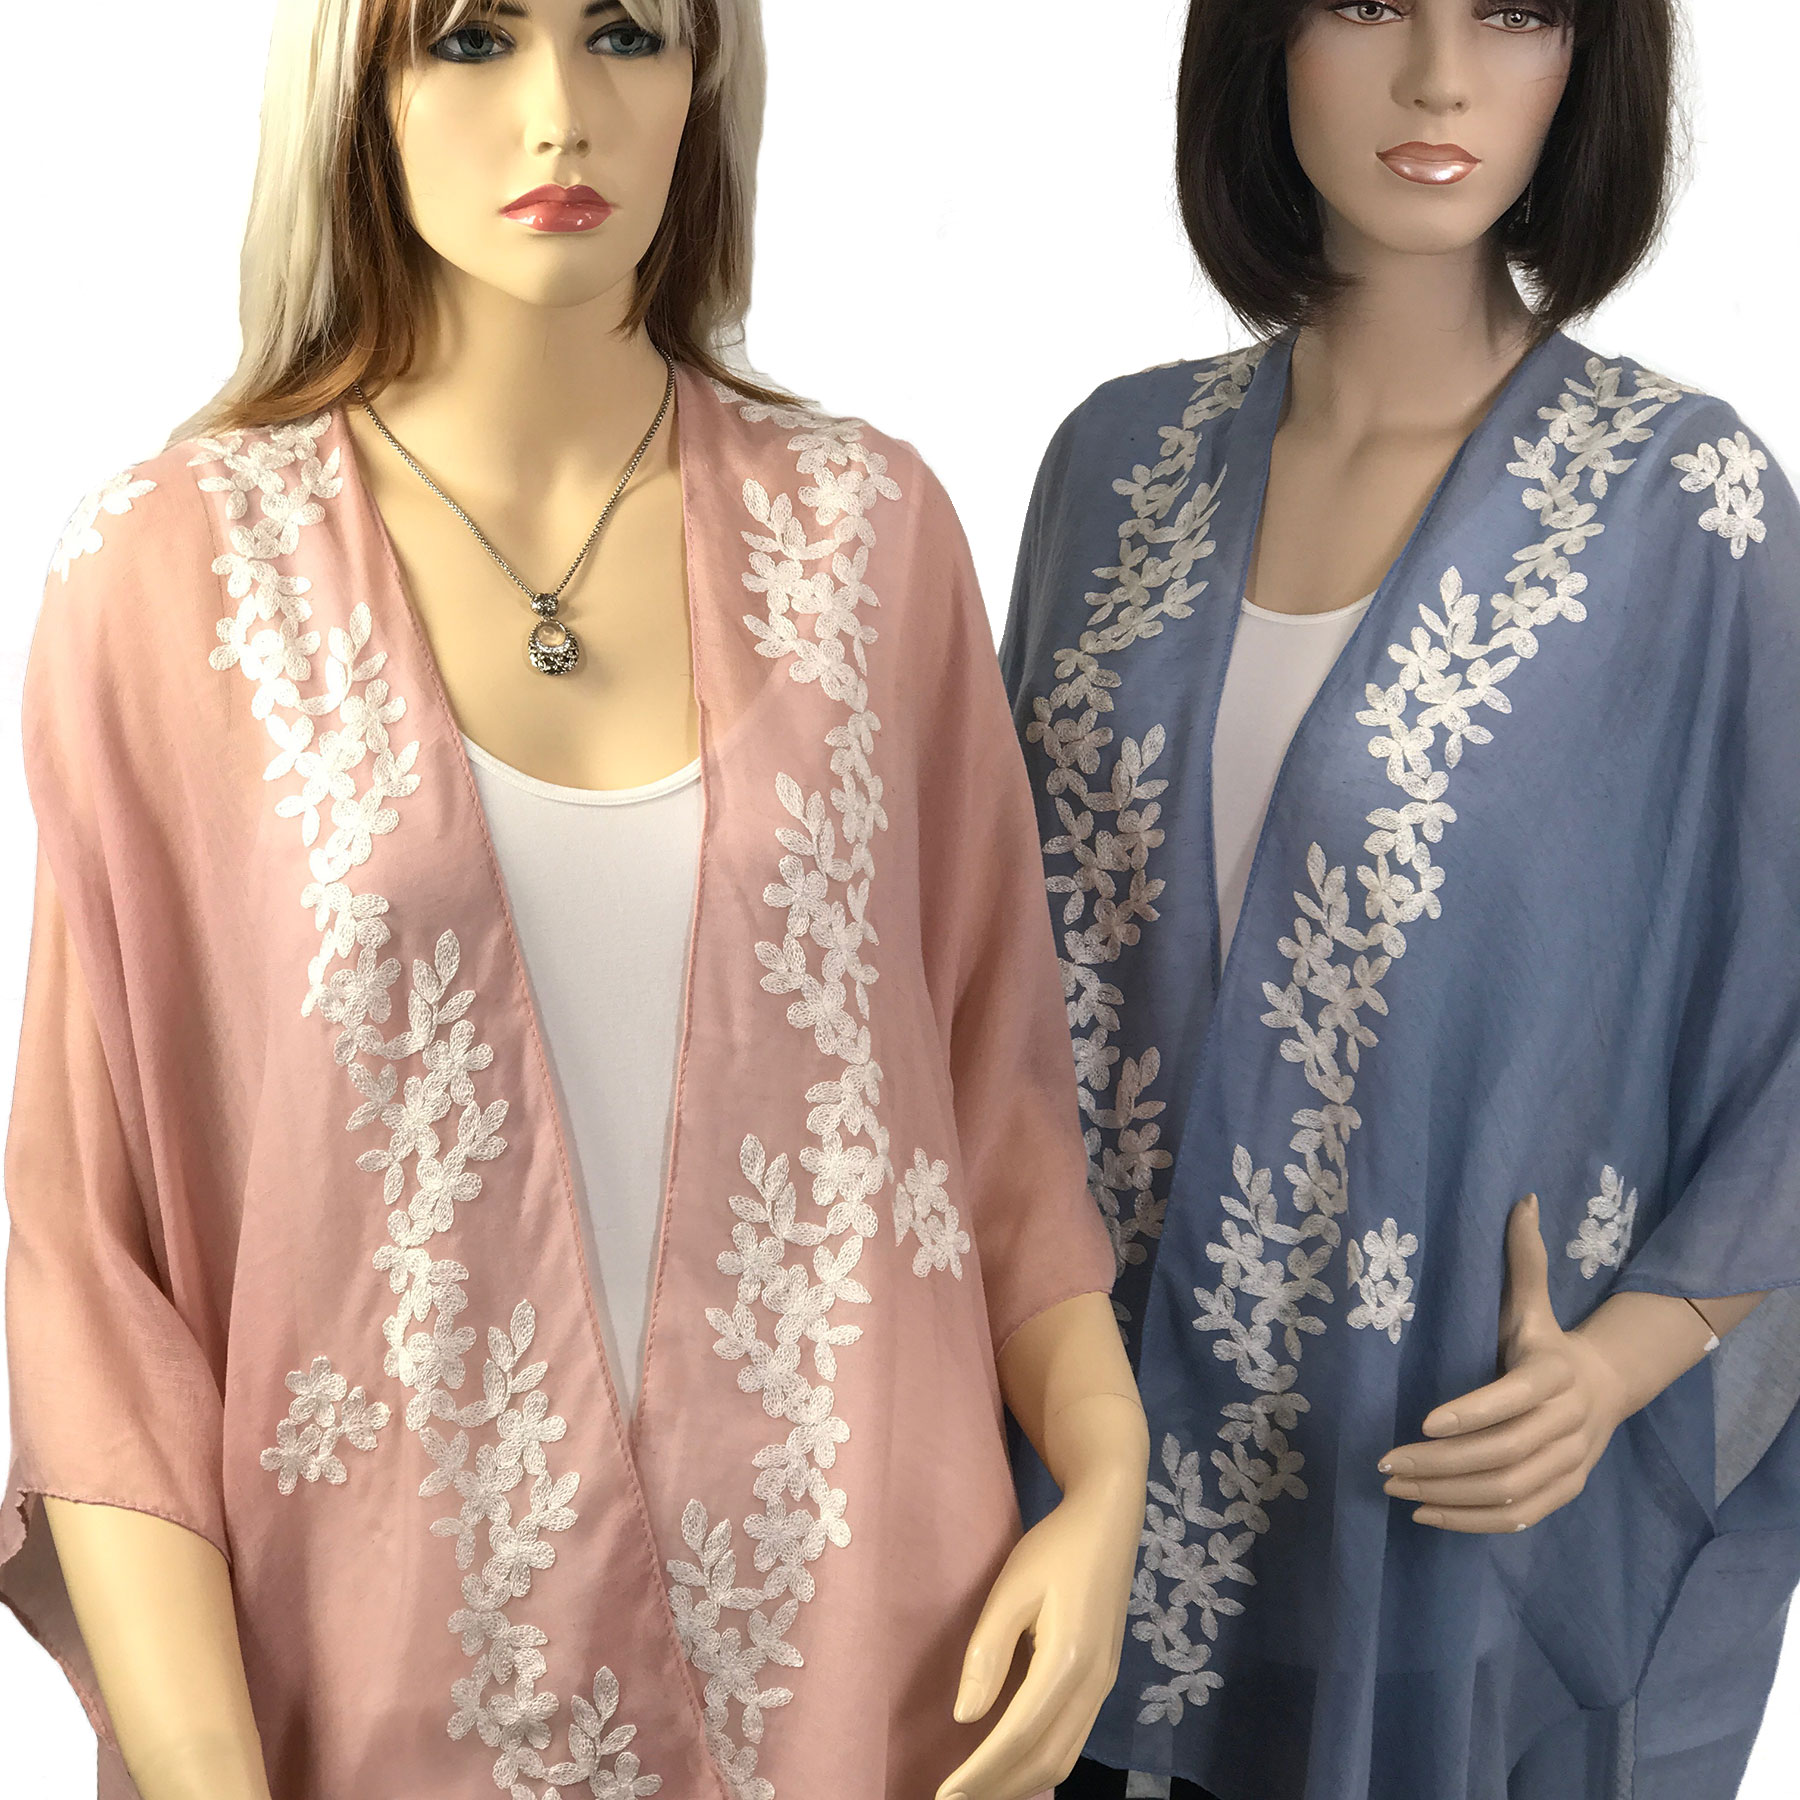 Kimono - Embroidered Floral 901